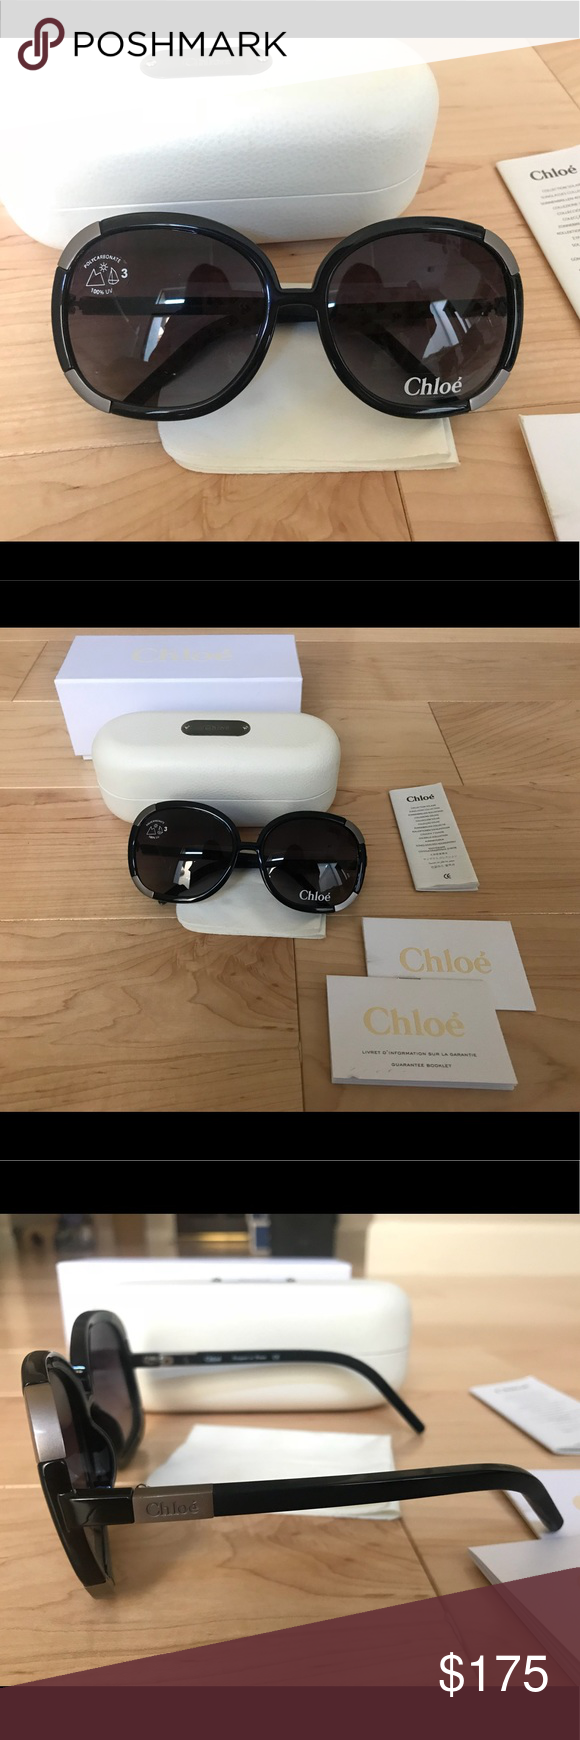 db2491f1b61a BRAND NEW Authentic Chloe Myrte Sunglasses Black Brand New Authentic Chloe  Myrte Sunglasses CL 2119 in